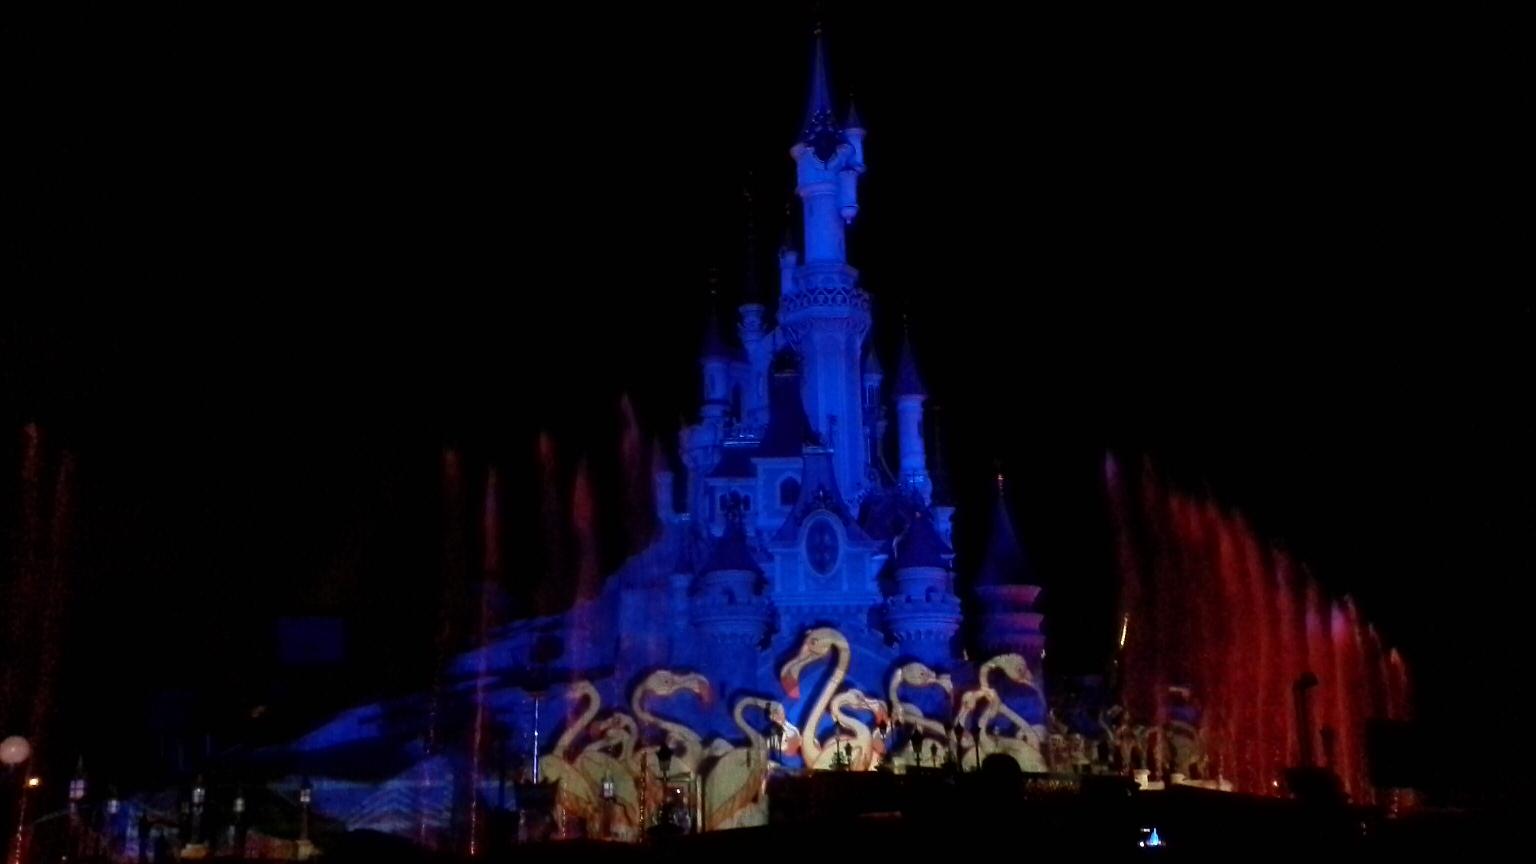 Spettacolo finale Disneyland Paris